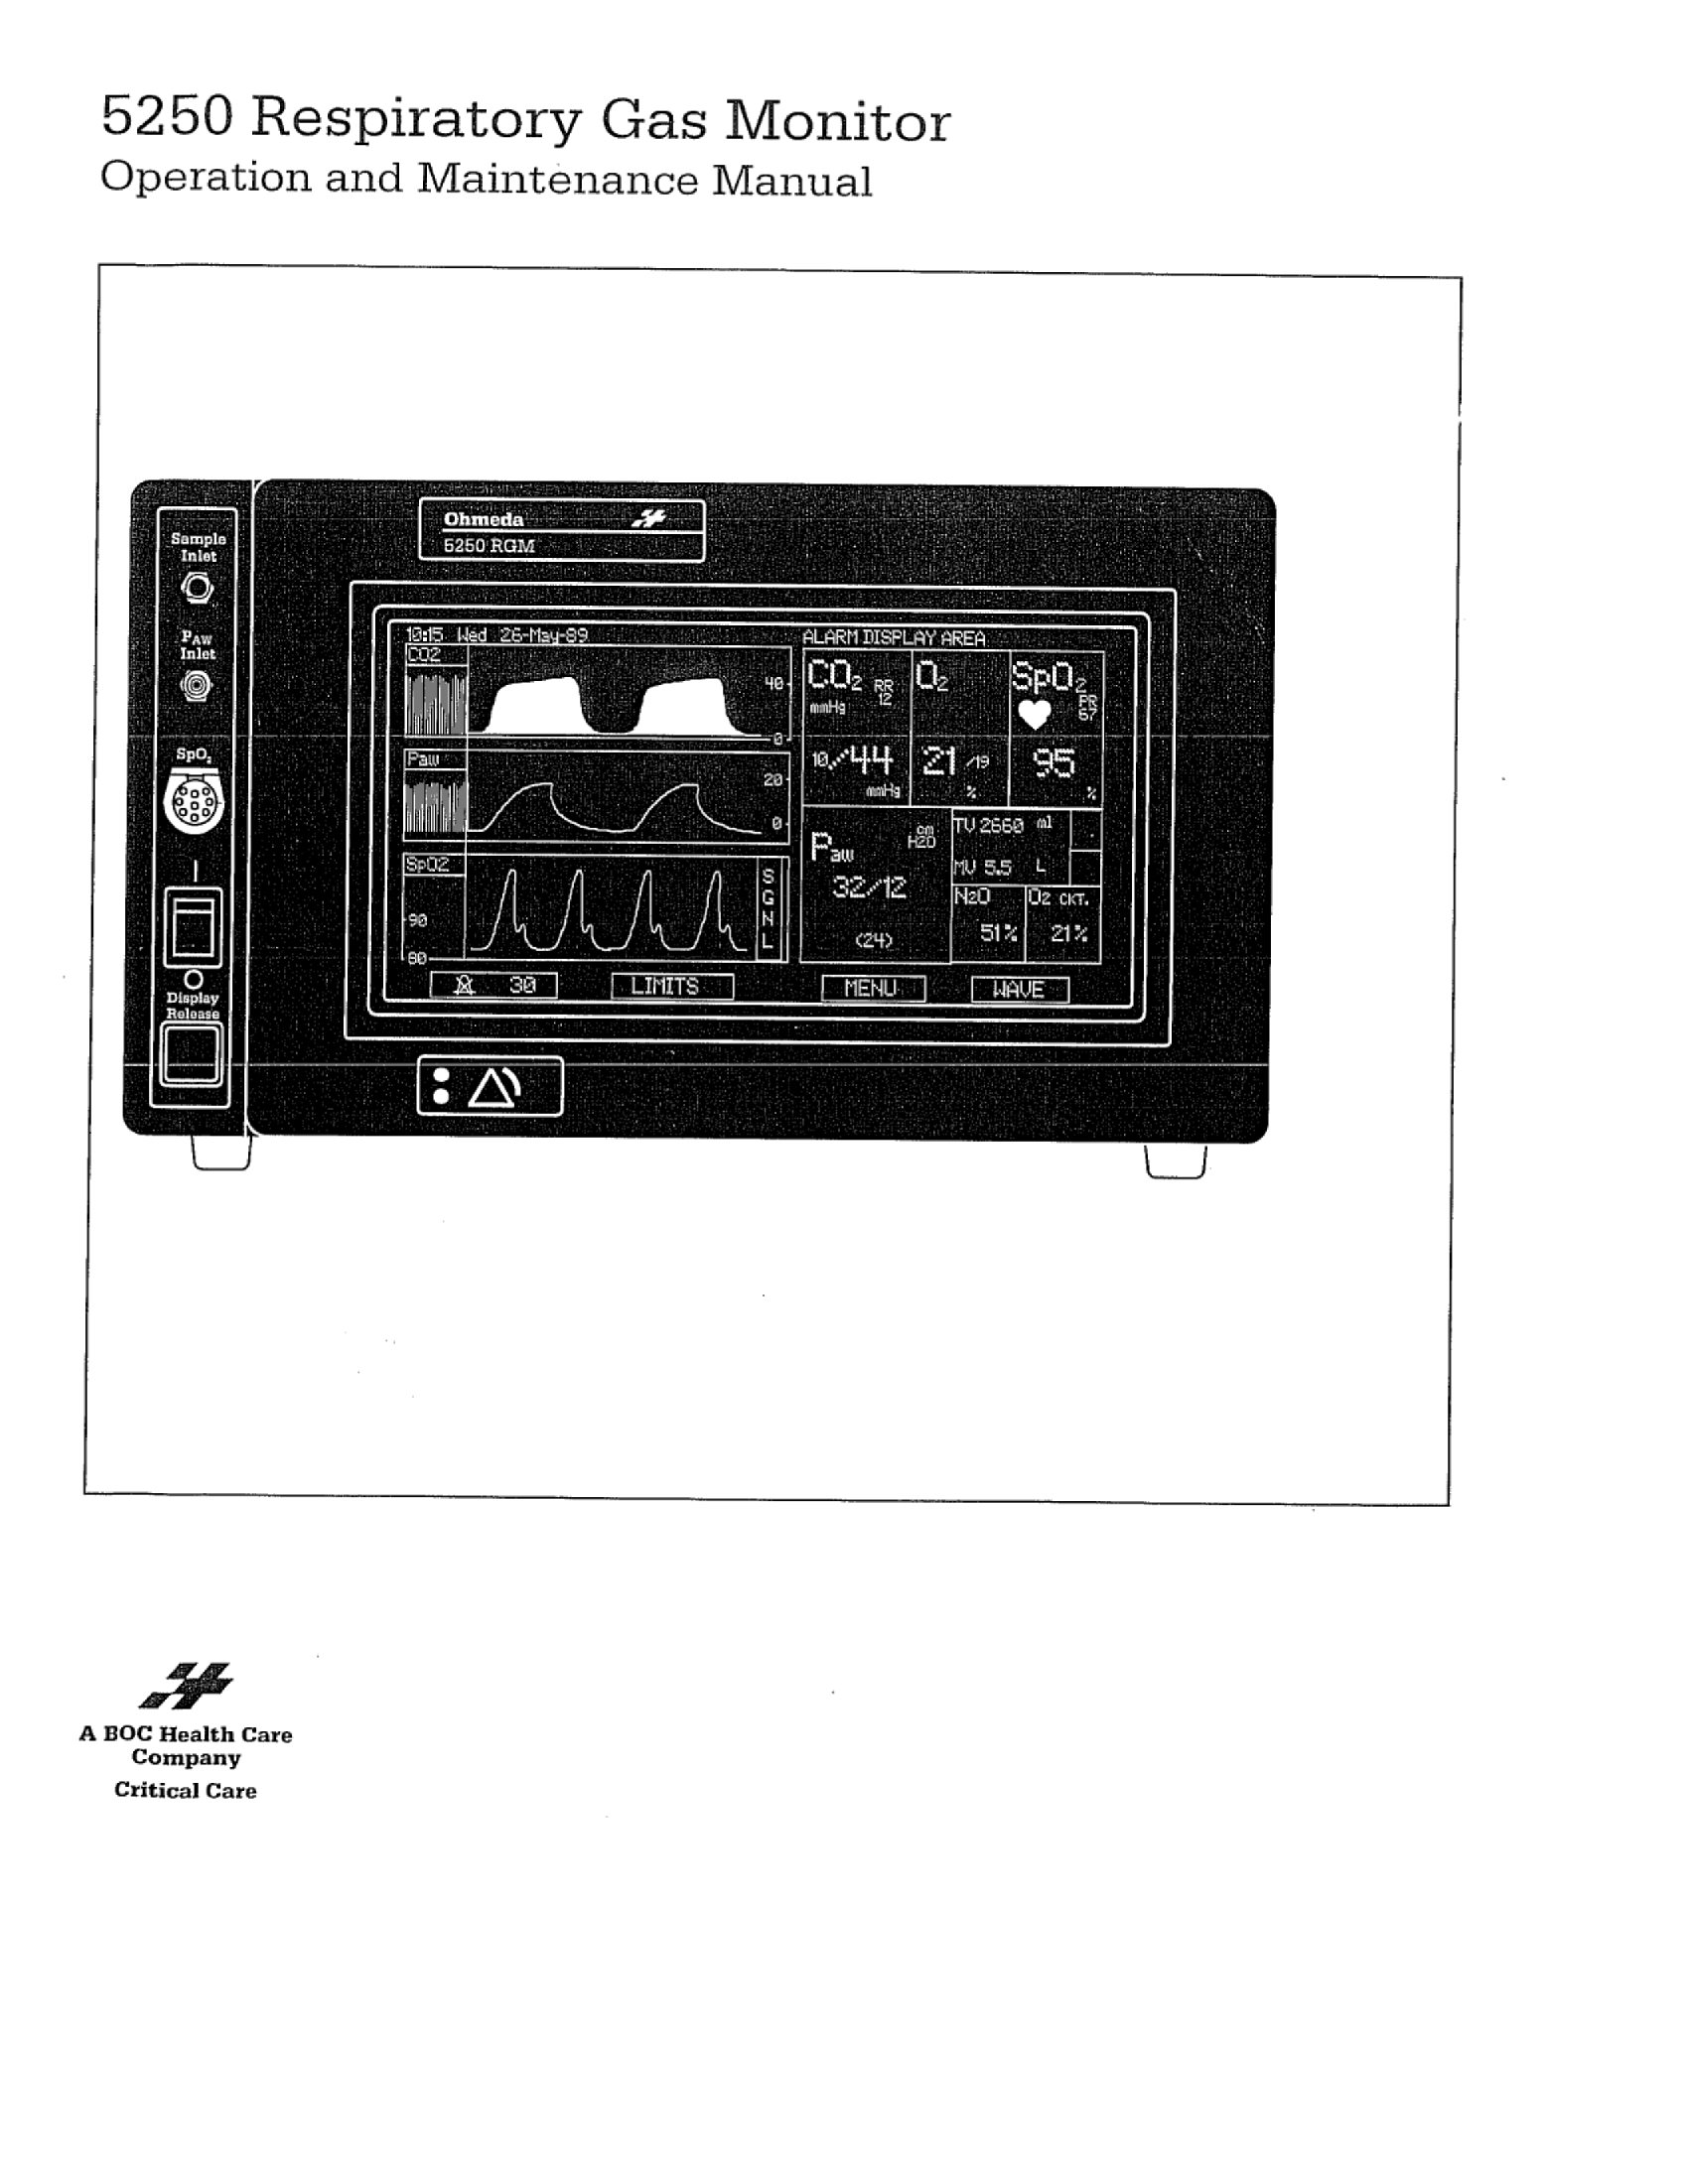 ohmeda 5250 service manual golden biomed rh goldenbiomed com service manual 2240 jd service manual 2240 jd